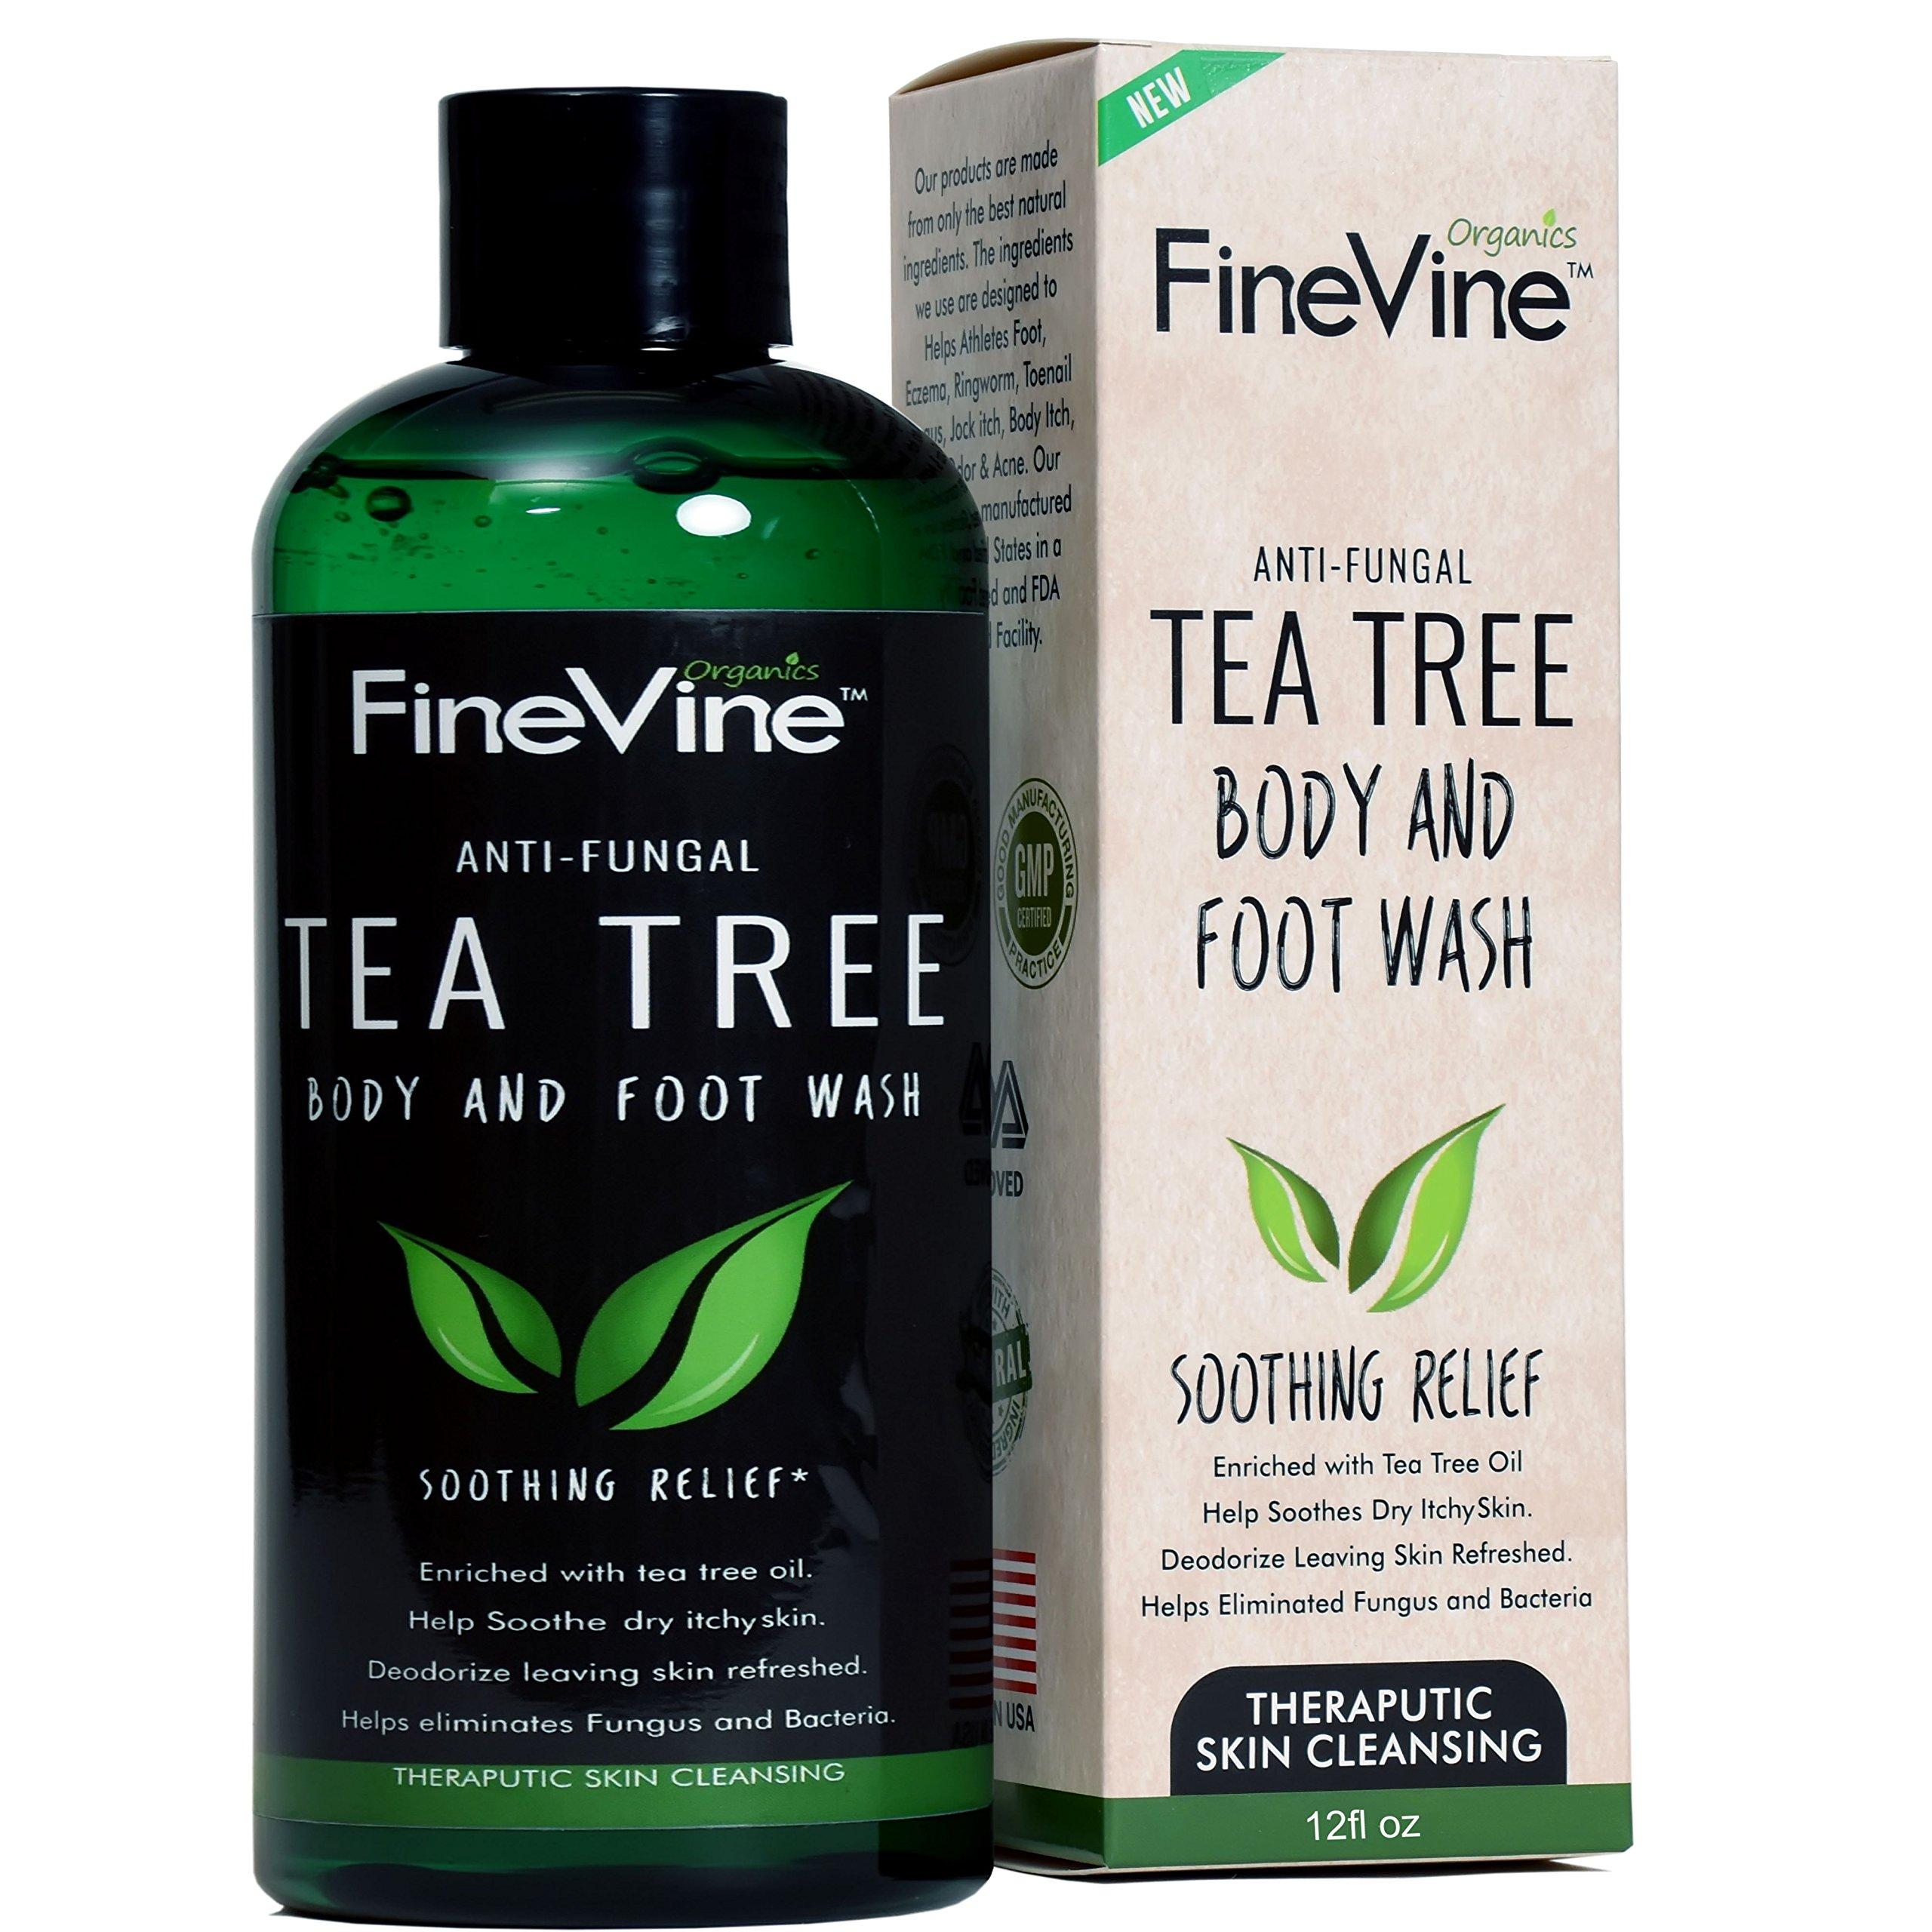 Antifungal Tea Tree Oil Body Wash - Made in USA - Helps Treat Eczema, Ringworm, Body Odor, Jock Itch, Acne, Toenail Fungus & Athlete Foot - Best Antibacterial Soap For Skin Irritations.